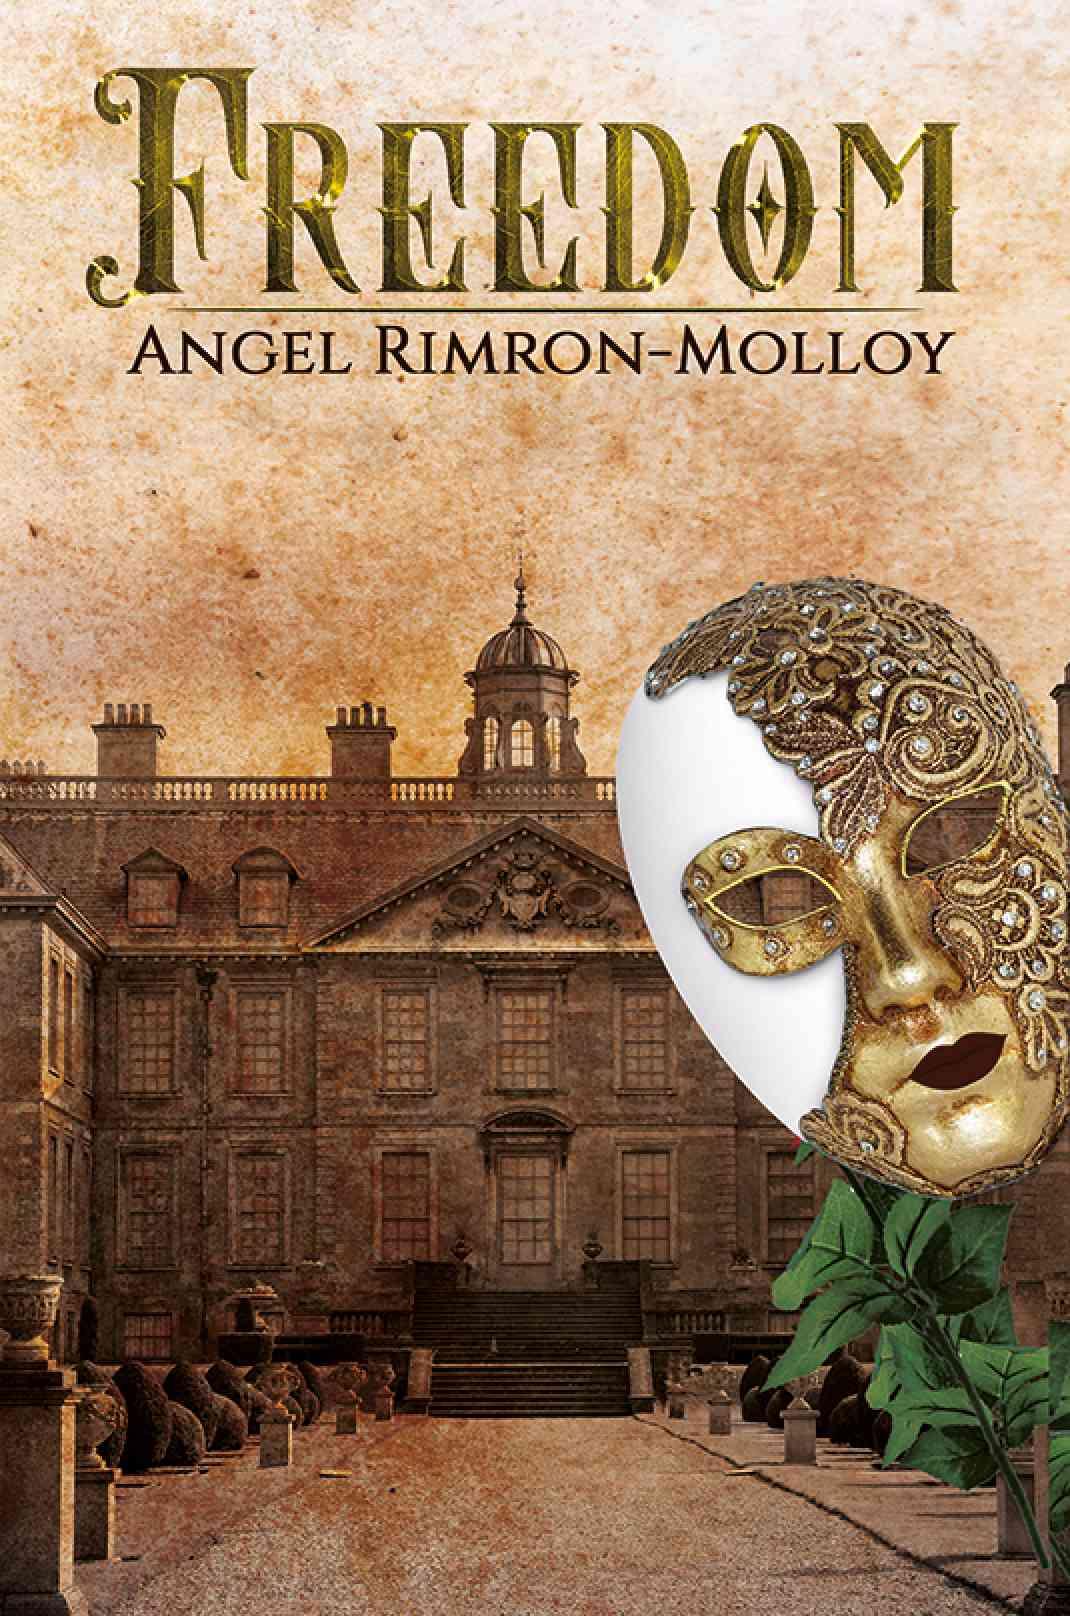 Freedom | Book| Austin Macauley Publishers